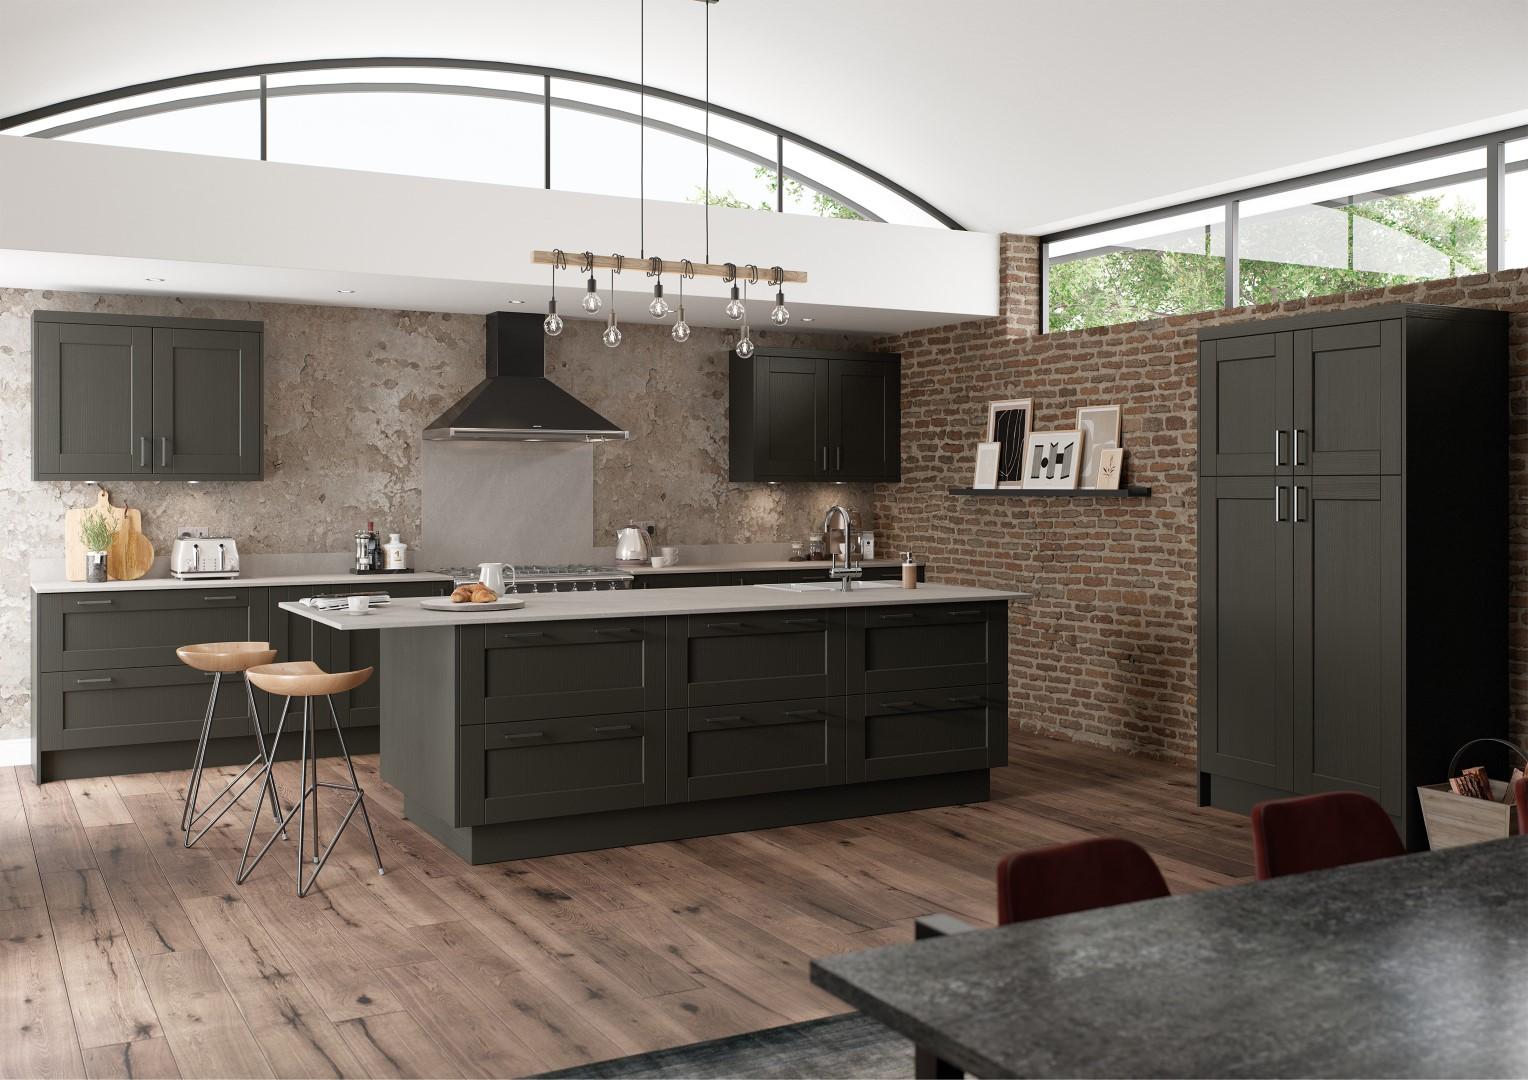 Kensington Graphite - Kitchen Design - Alan Kelly Kitchens Waterford - 5